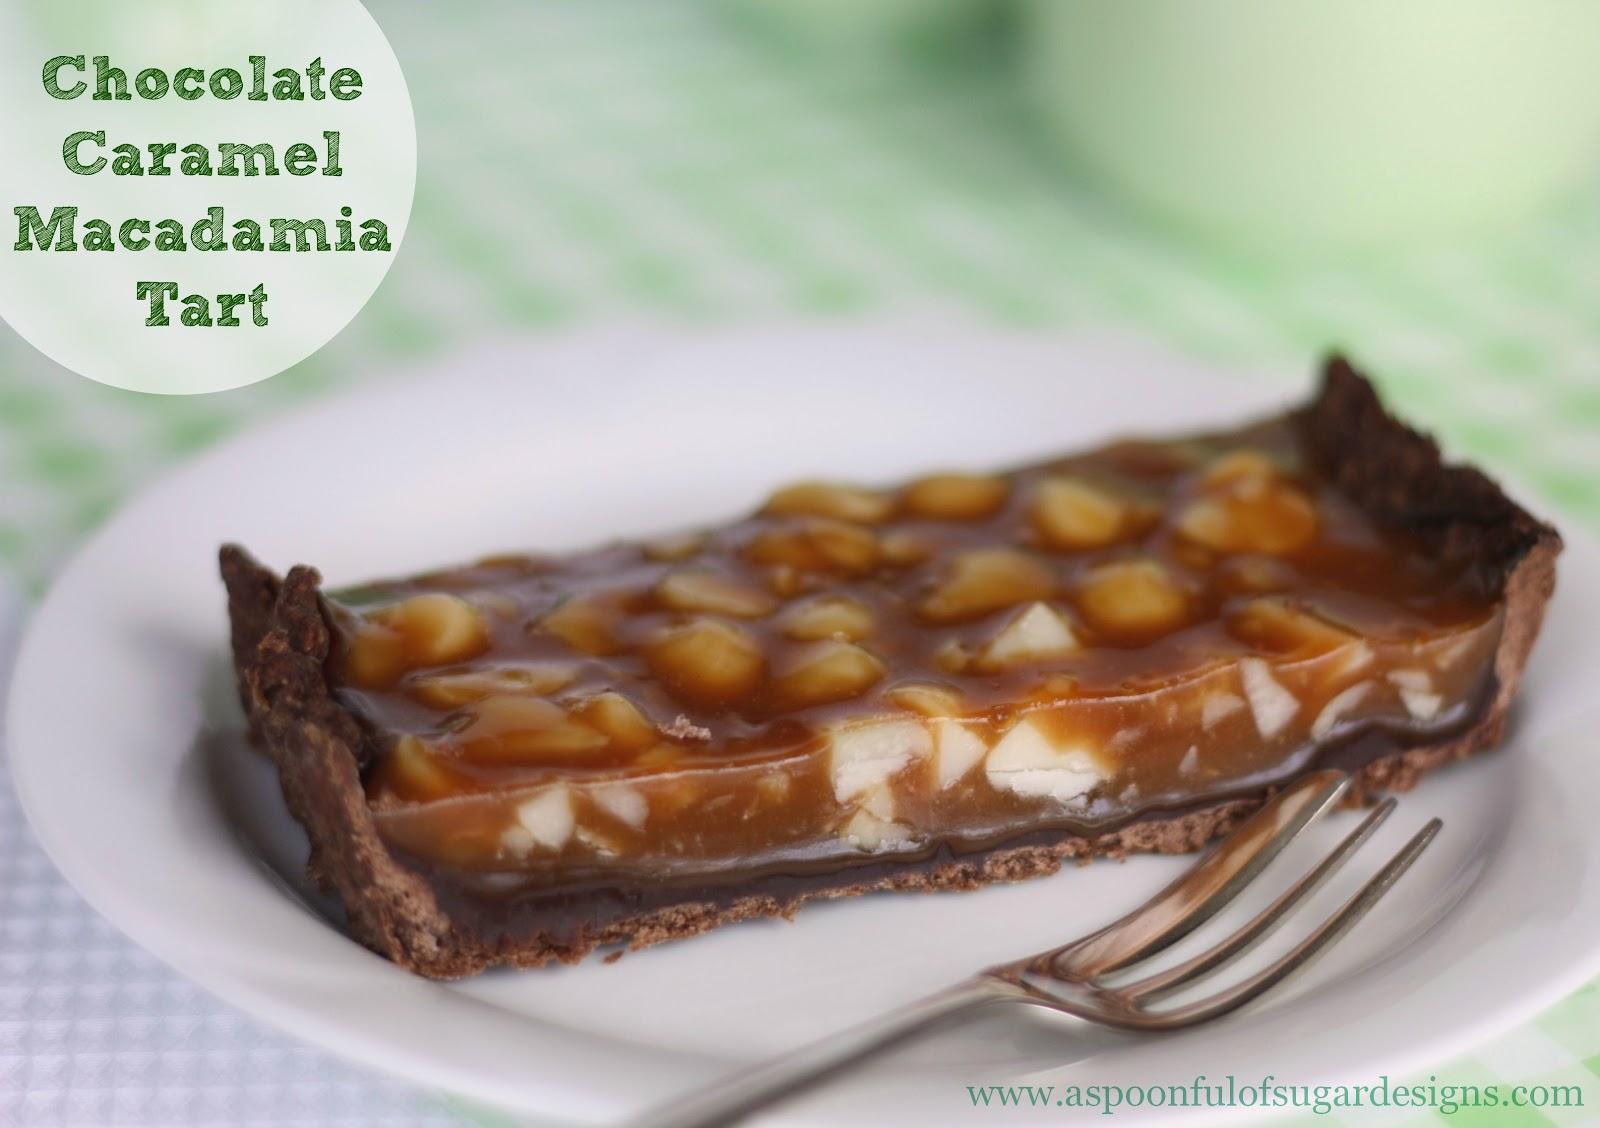 ... caramel is really dark and white chocolate caramel white chocolate